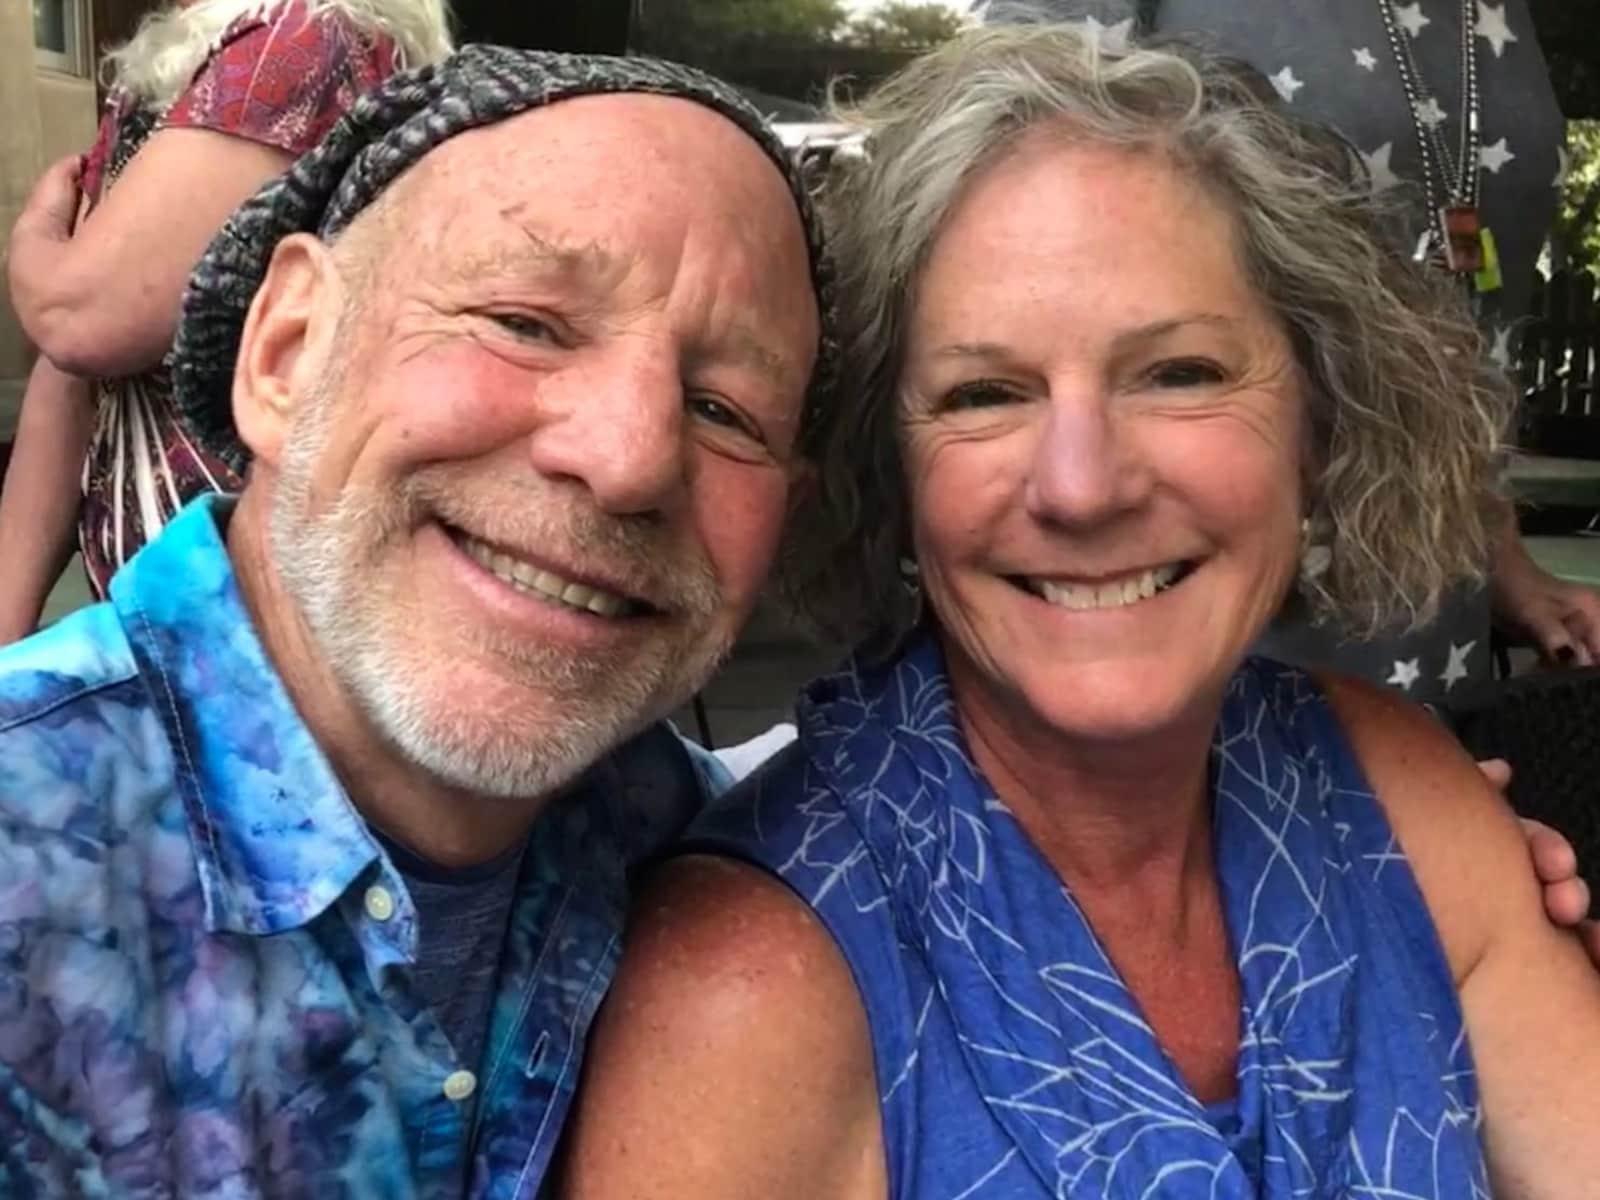 Barbara & Randal from Durango, Colorado, United States